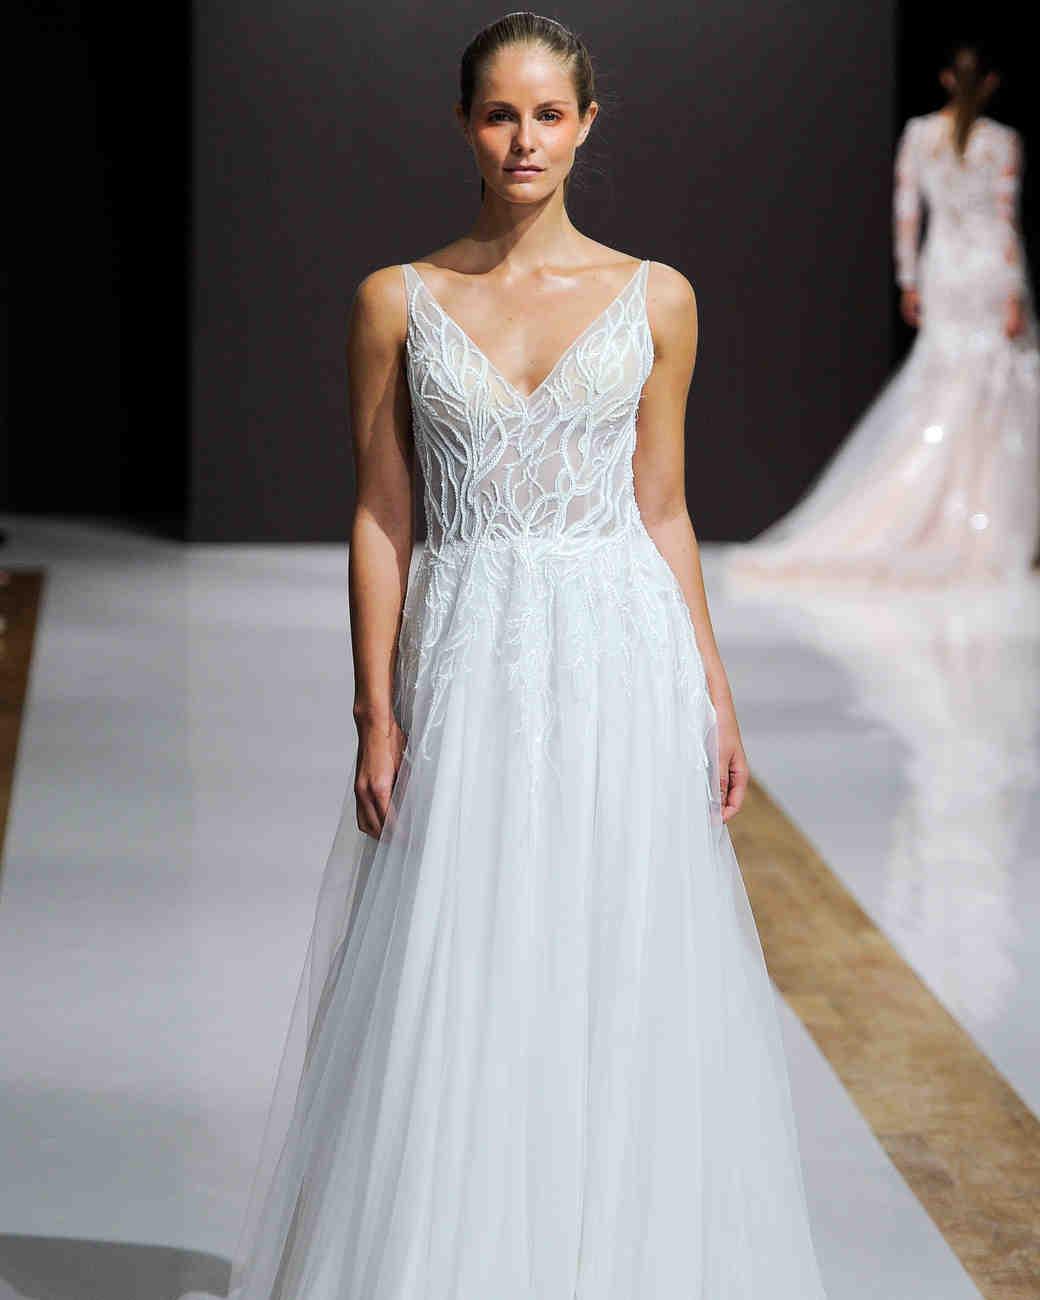 Wedding Gowns In Nyc: Mark Zunino, Bridal Fall 2018, New York City, October 2017